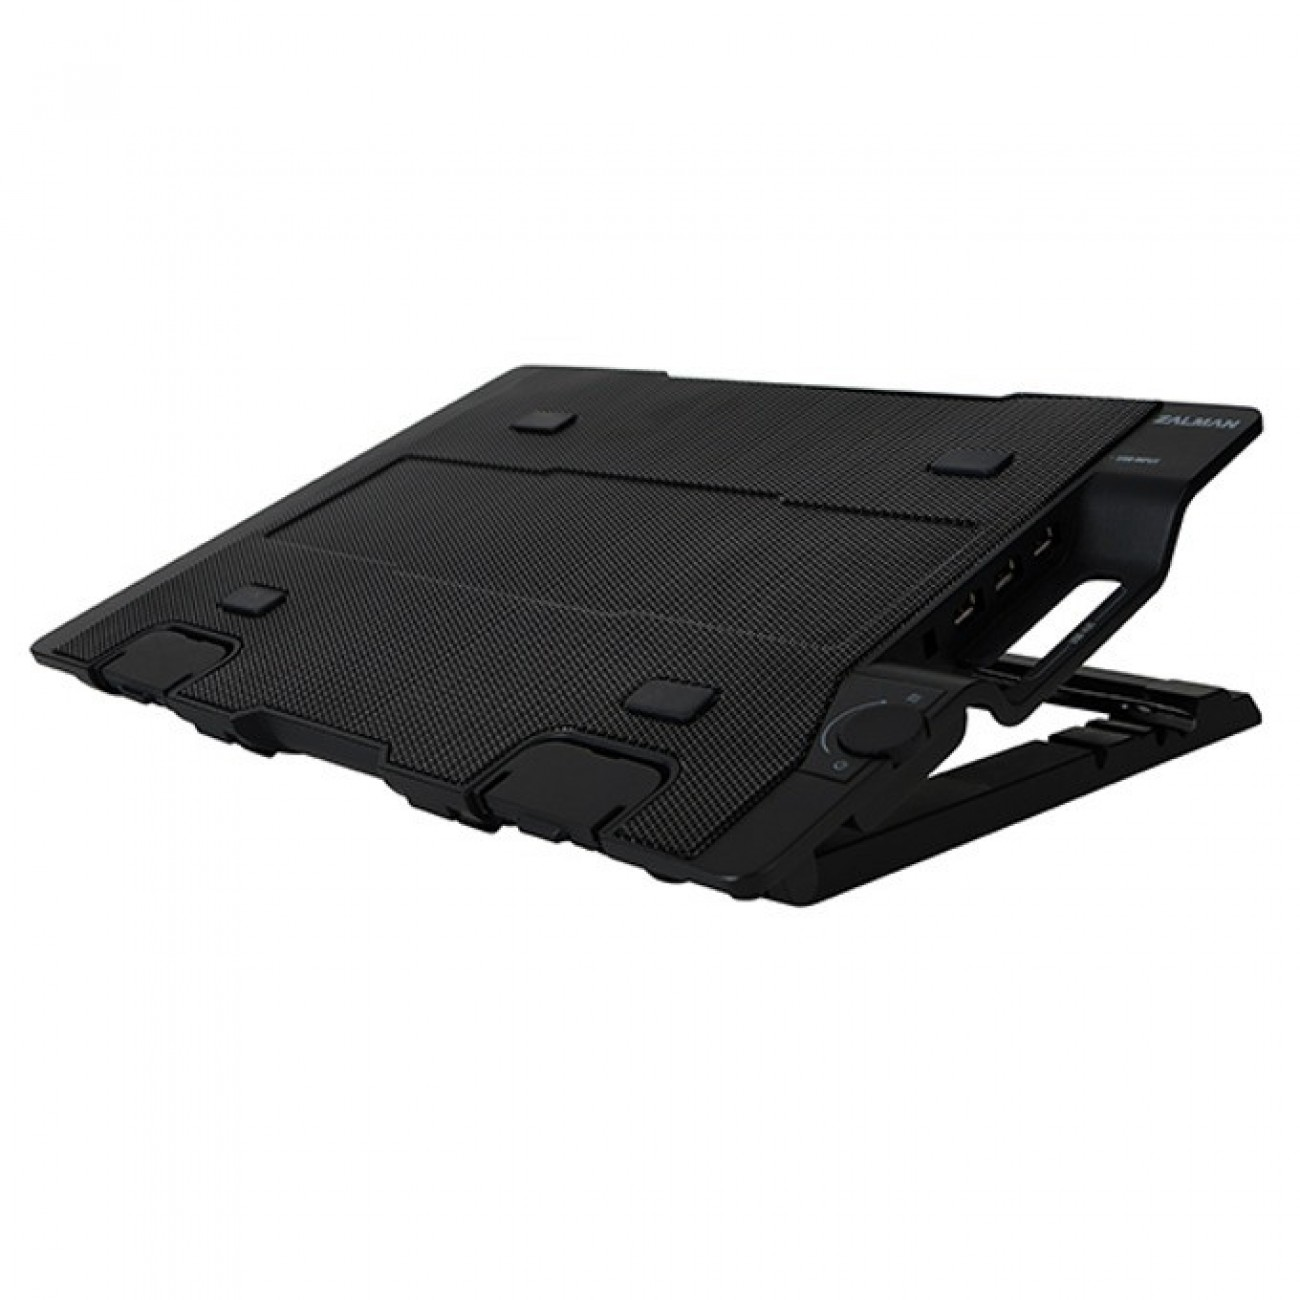 Охлаждаща поставка за лаптоп Zalman NS2000, за лаптопи до 17 (43.18 cm), черна в Лаптоп Охладители -  | Alleop